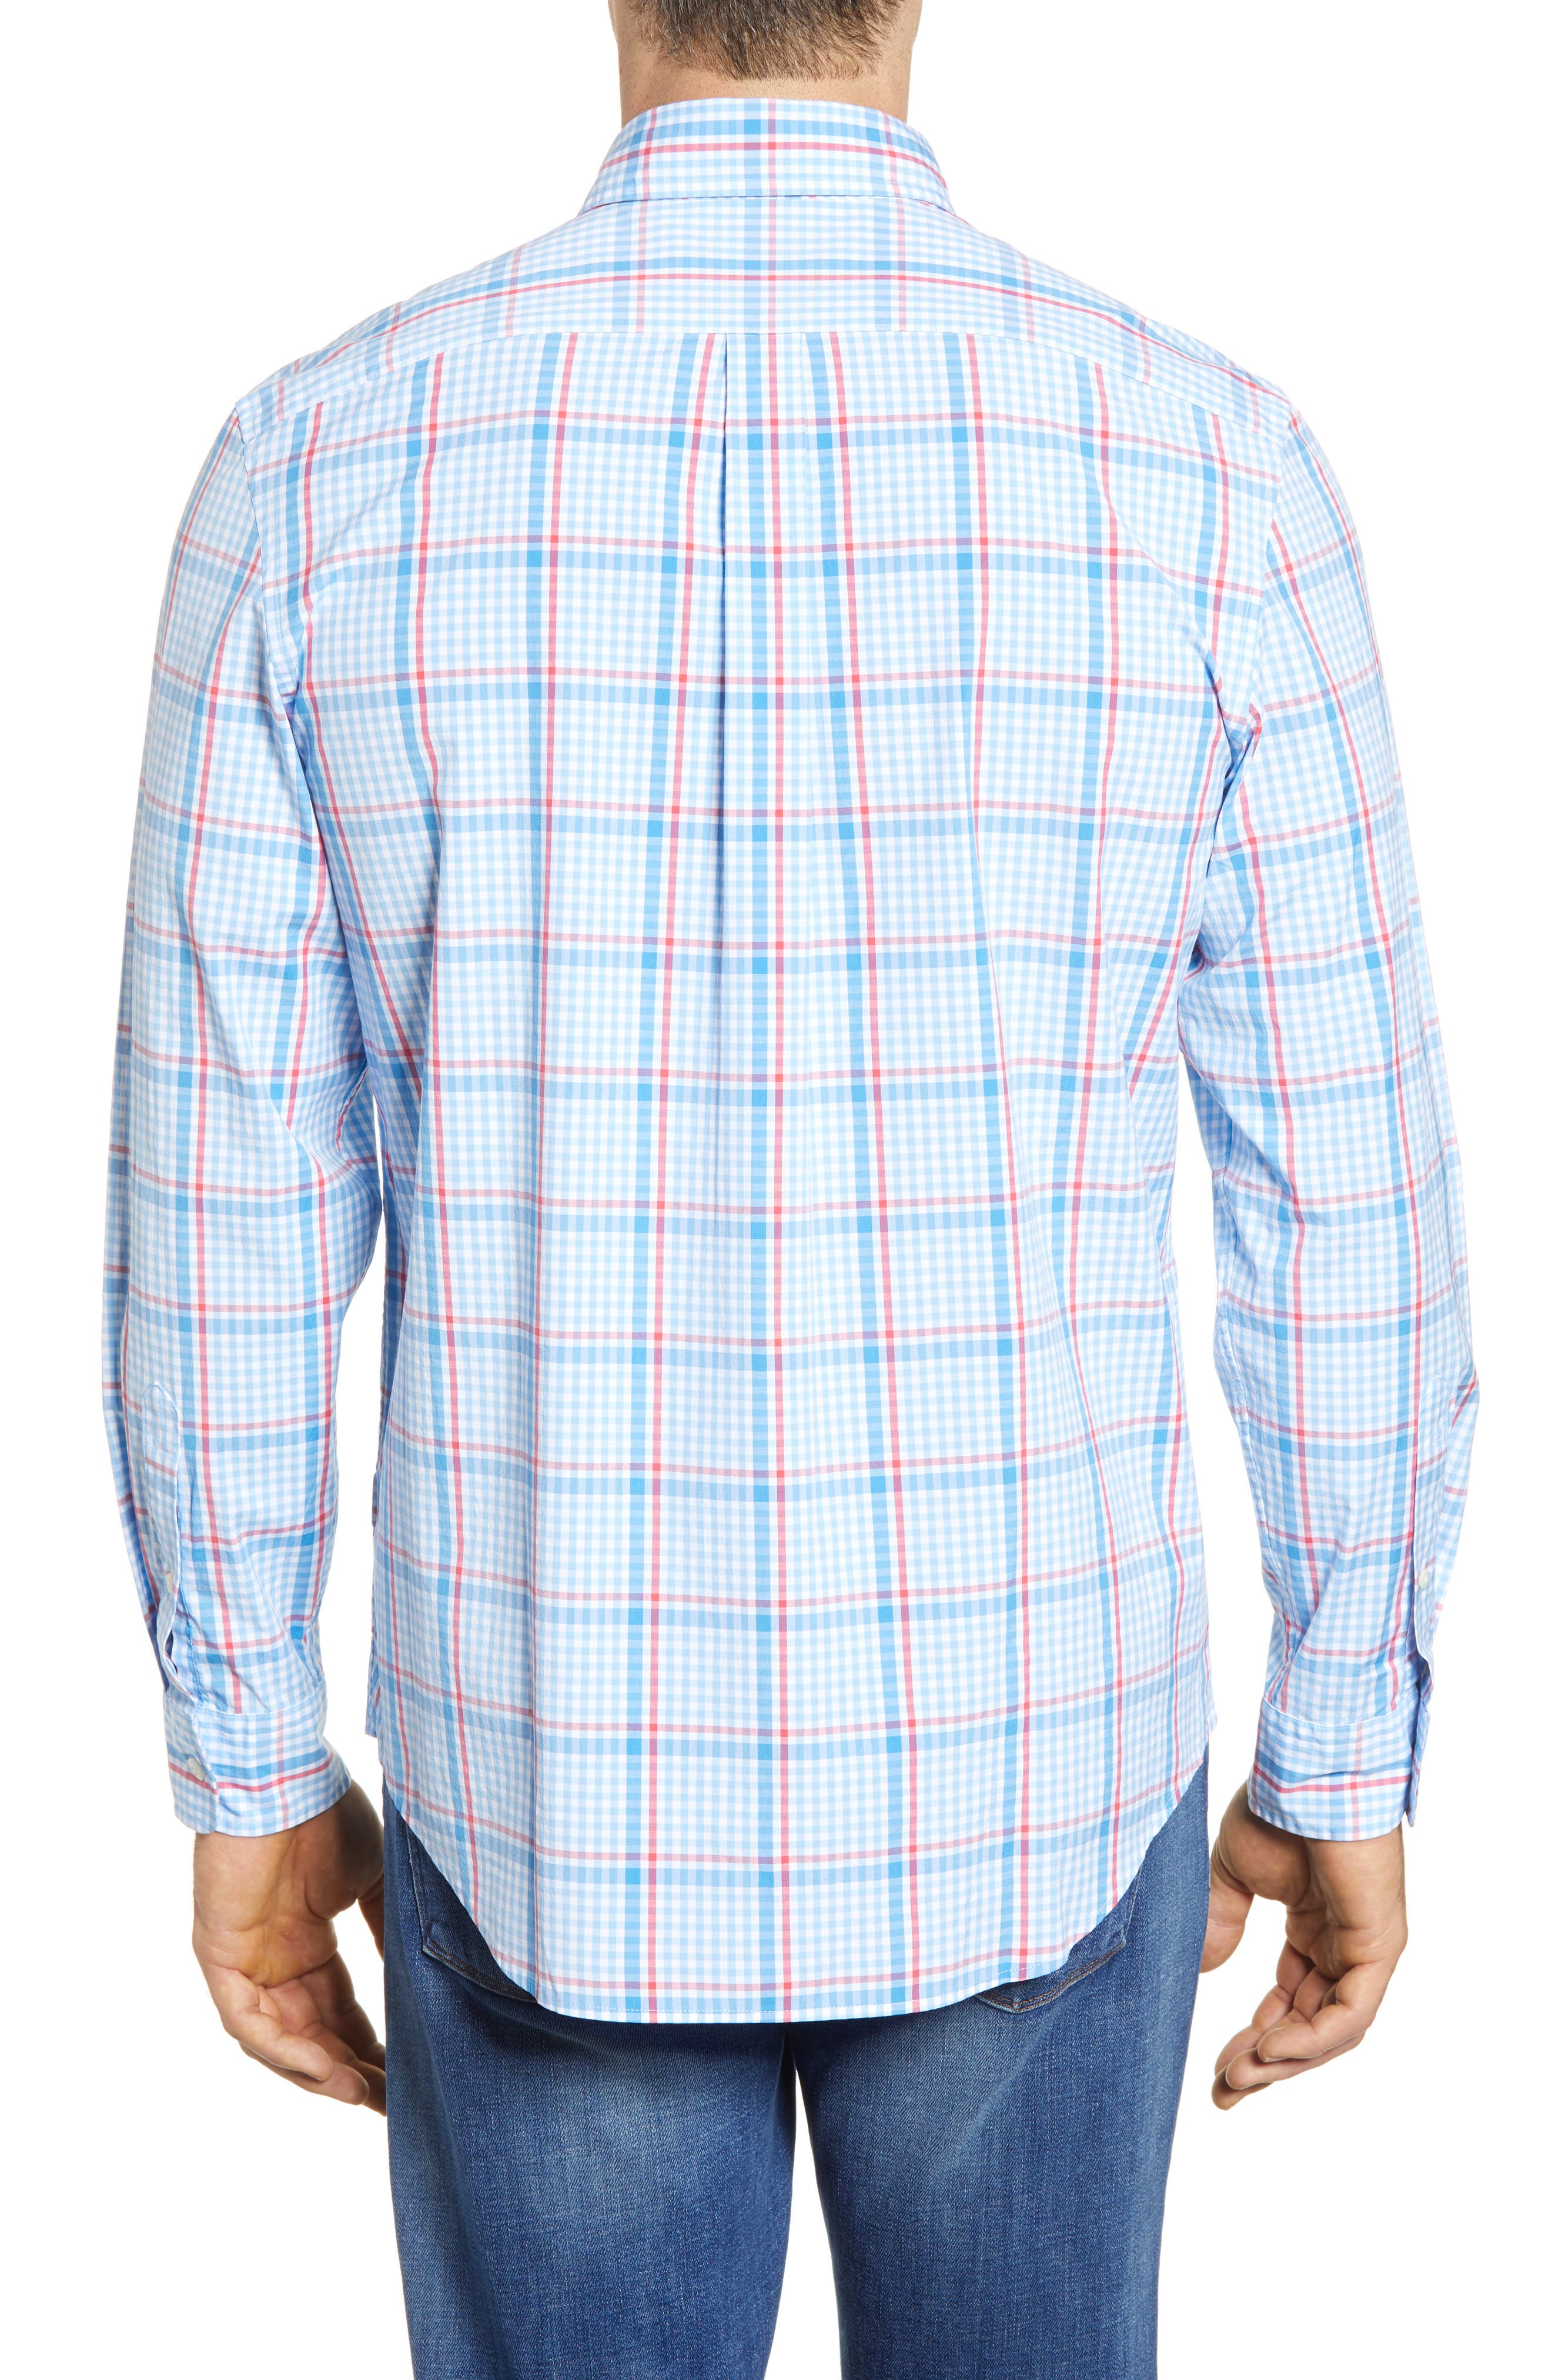 Palmer Island Classic Fit Plaid Sport Shirt,                             Alternate thumbnail 2, color,                             484